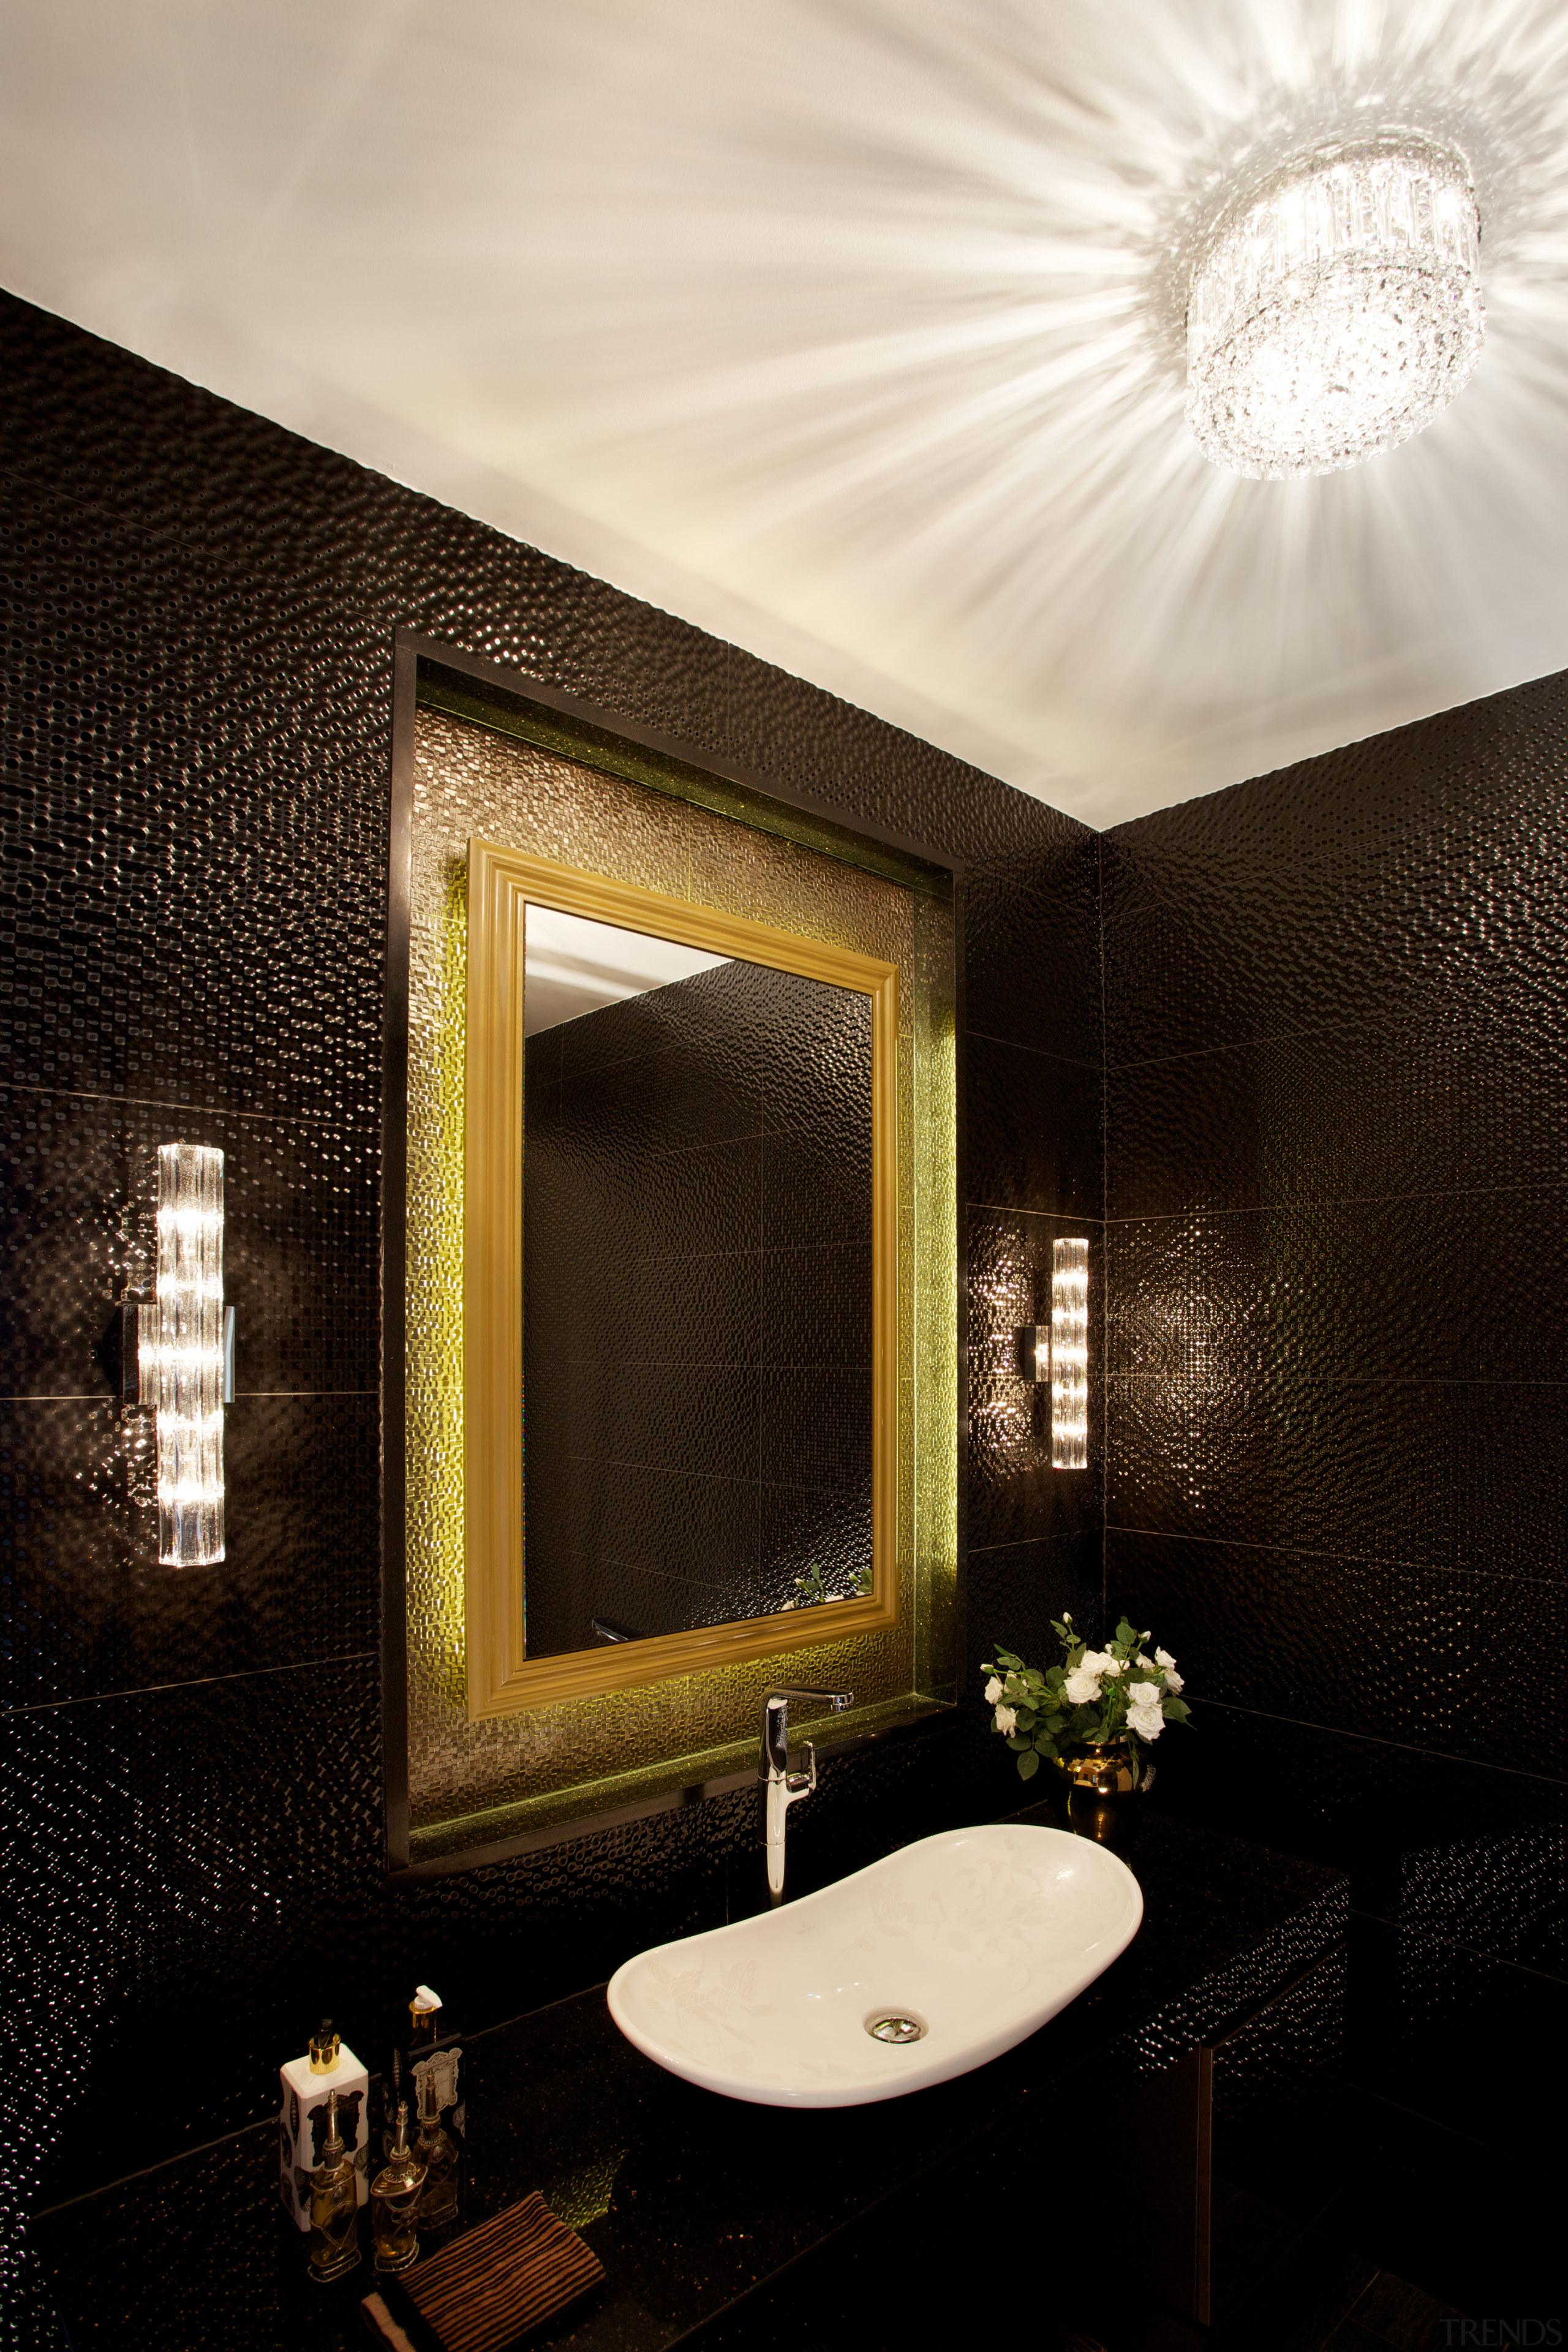 Powder room by architect Henry Lin - Powder bathroom, ceiling, daylighting, interior design, light fixture, lighting, room, wall, black, white